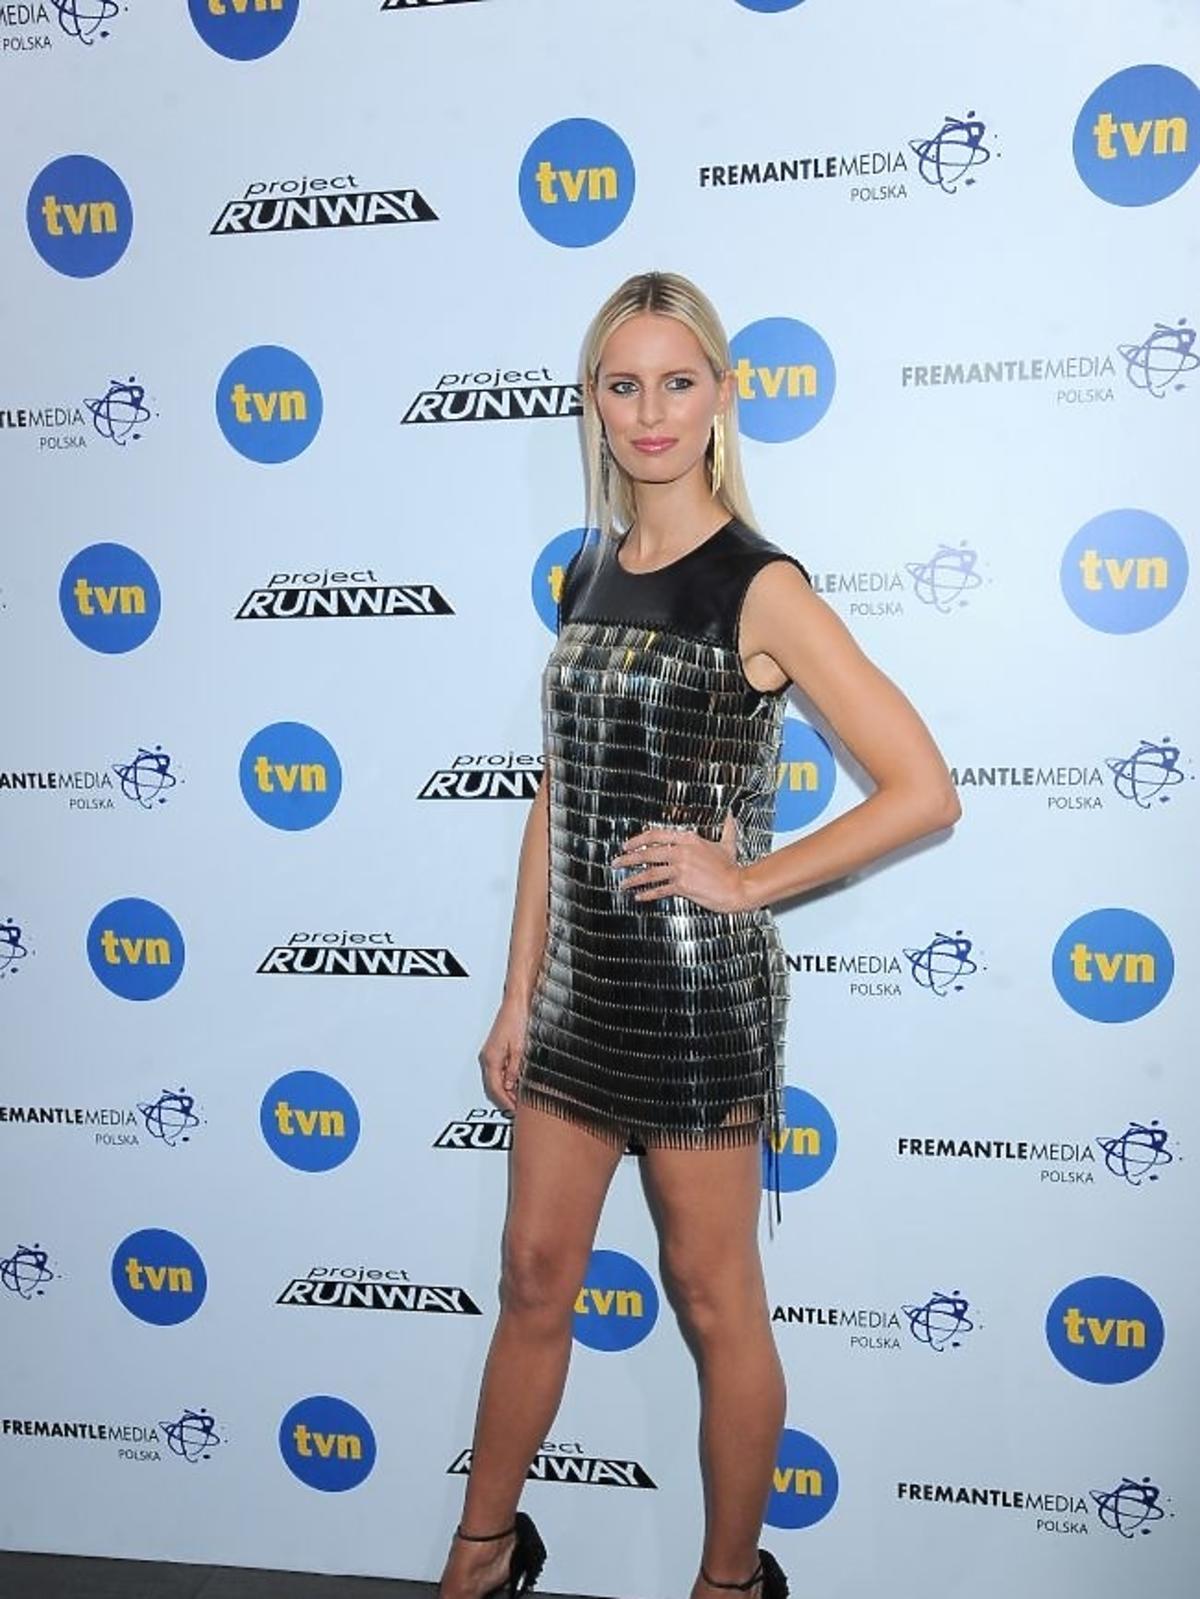 Karolina Kurkova w finale Project Runway 2